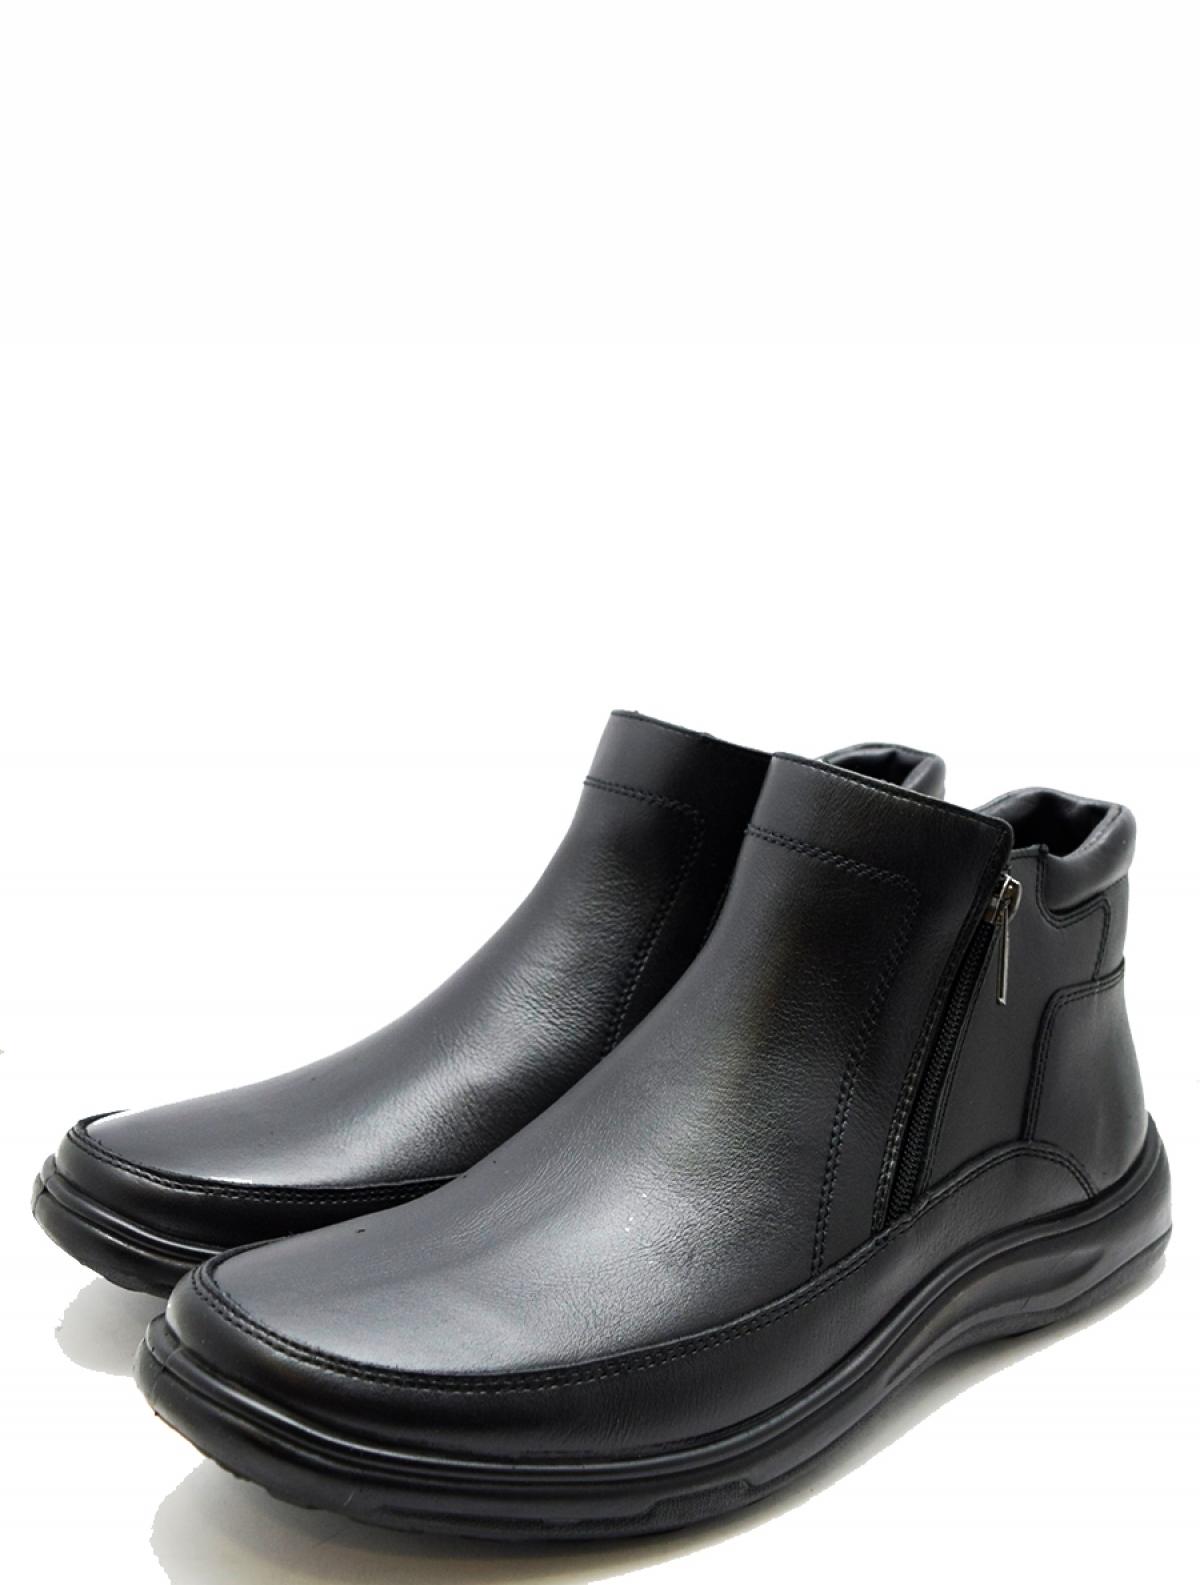 Marko 4280 мужские ботинки